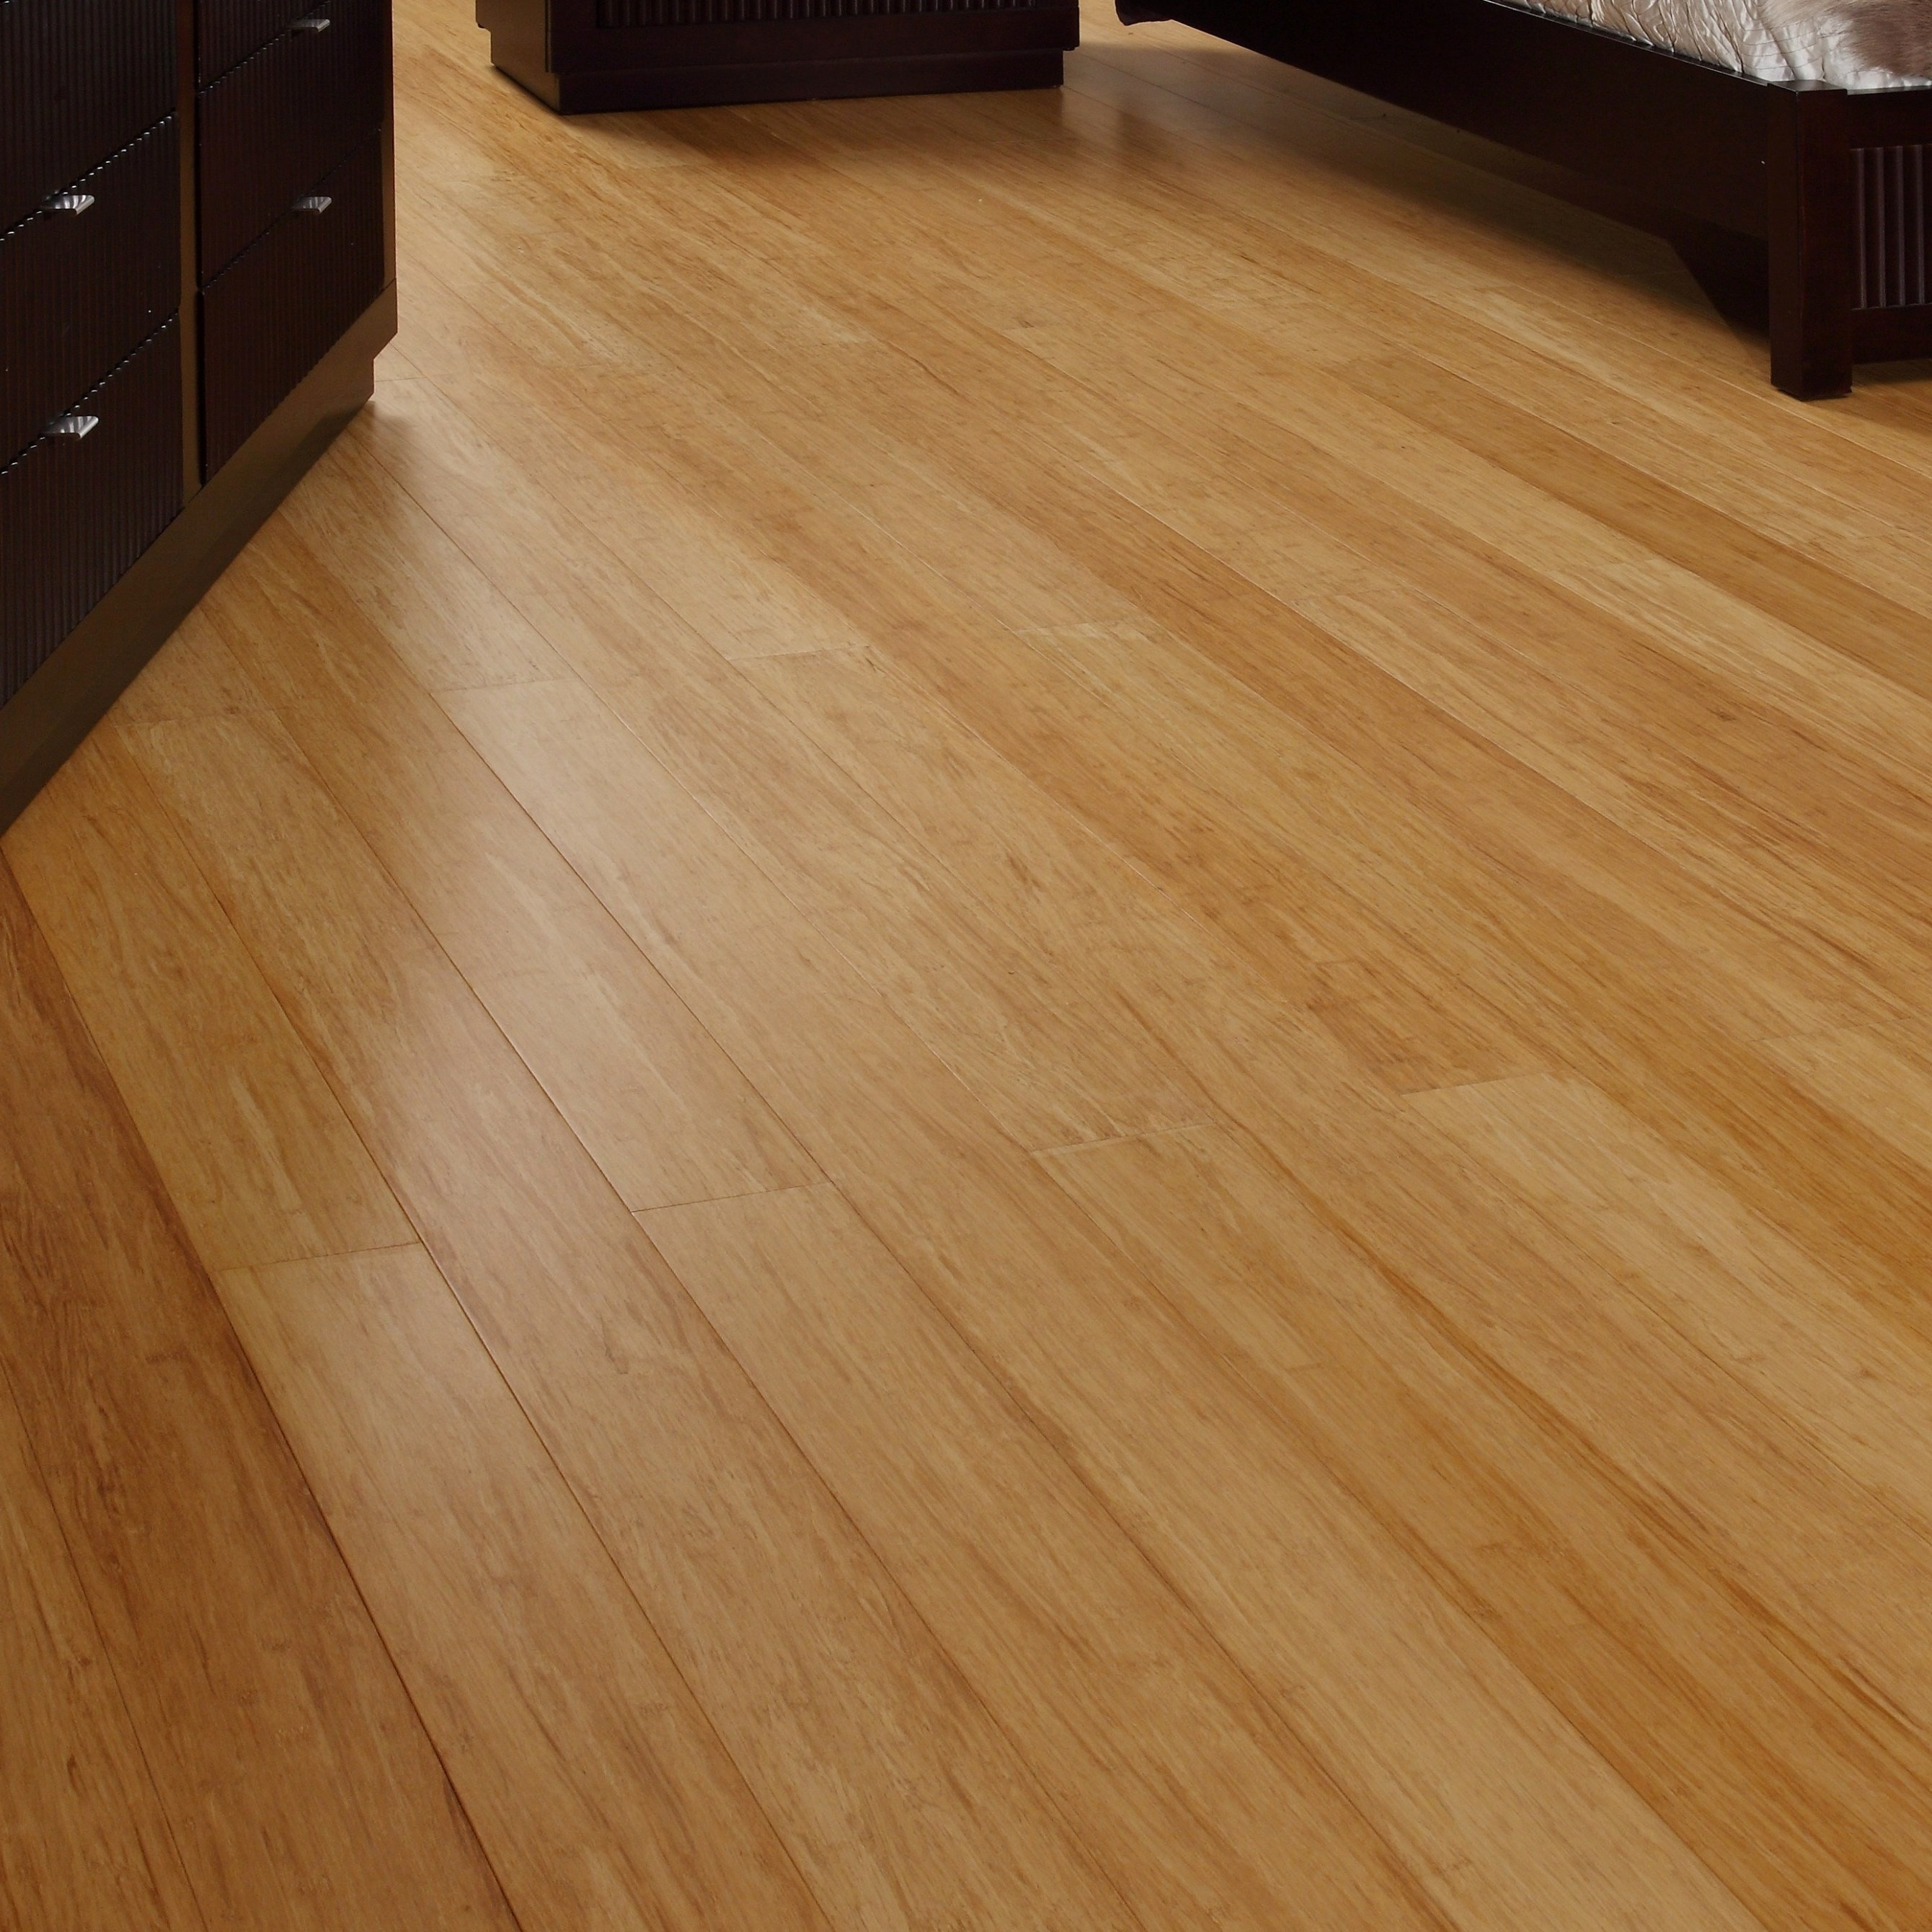 stranded bamboo flooring a new weave in flooring. Black Bedroom Furniture Sets. Home Design Ideas